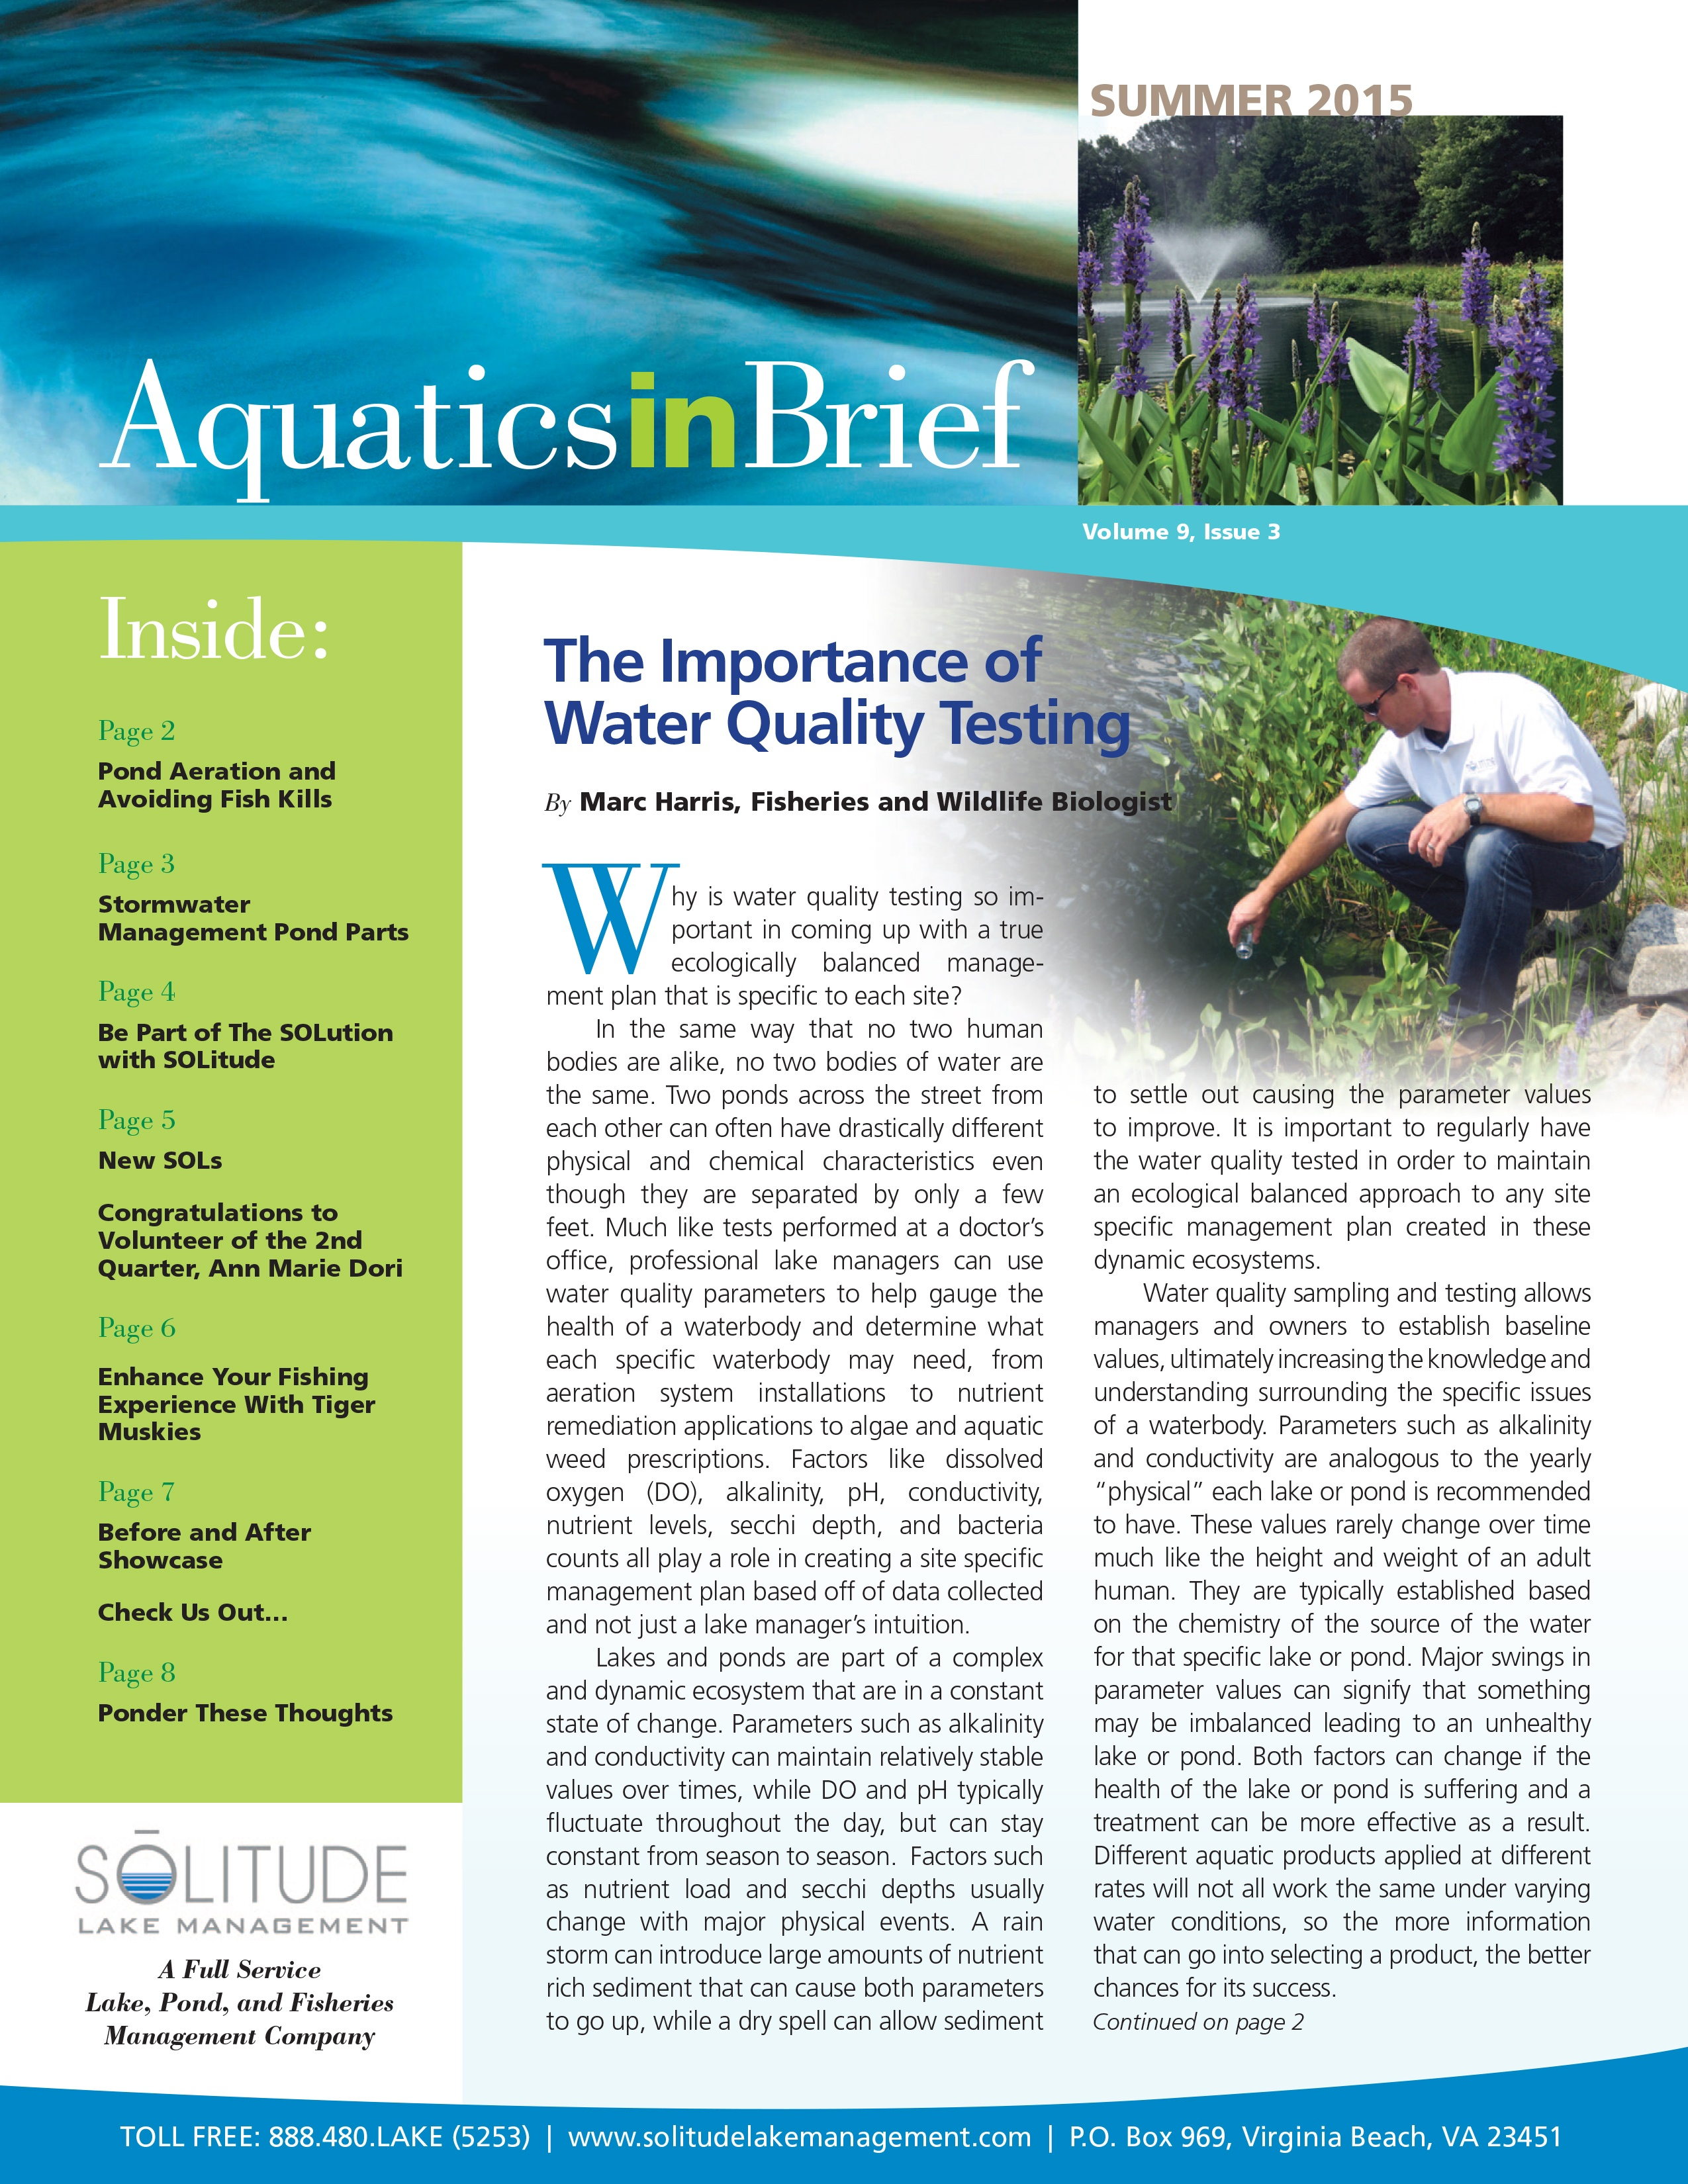 aquatics-in-brief-summer-2015